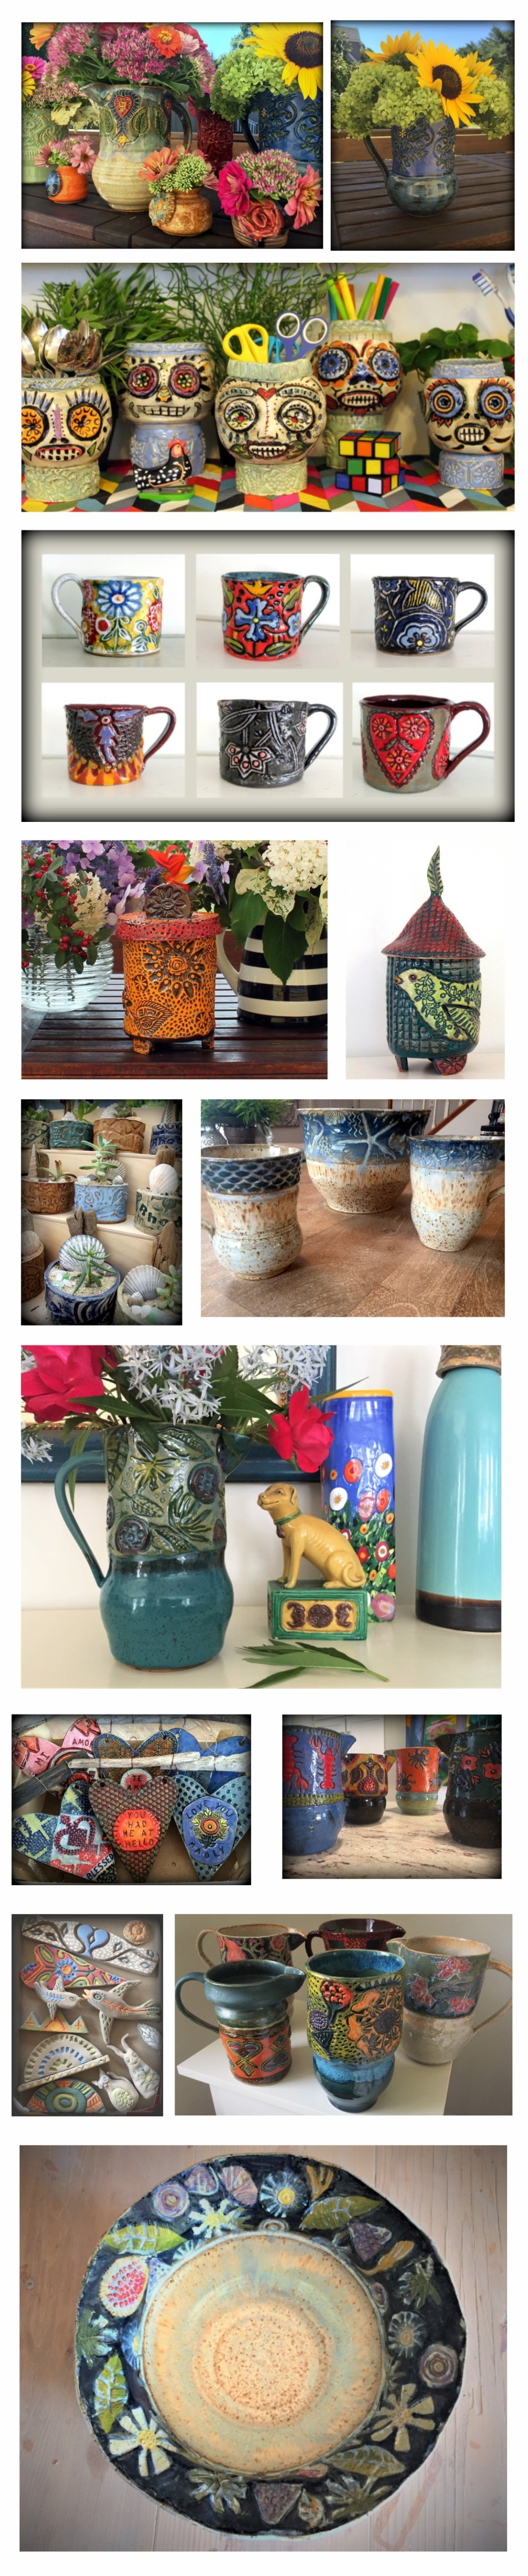 __BCM pottery pics